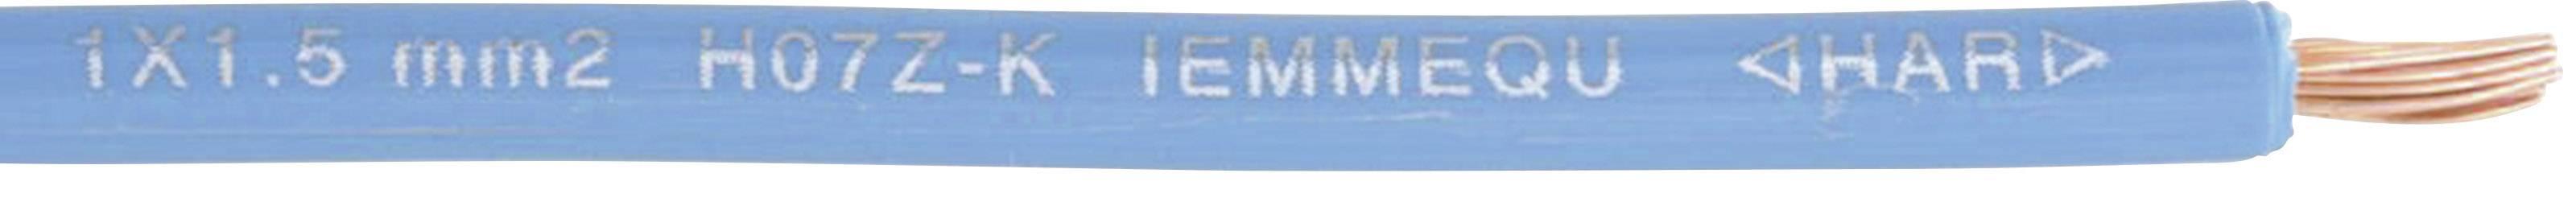 Opletenie / lanko Faber Kabel 040325 H05Z-K, 1 x 1 mm², vonkajší Ø 2.50 mm, 100 m, tmavomodrá